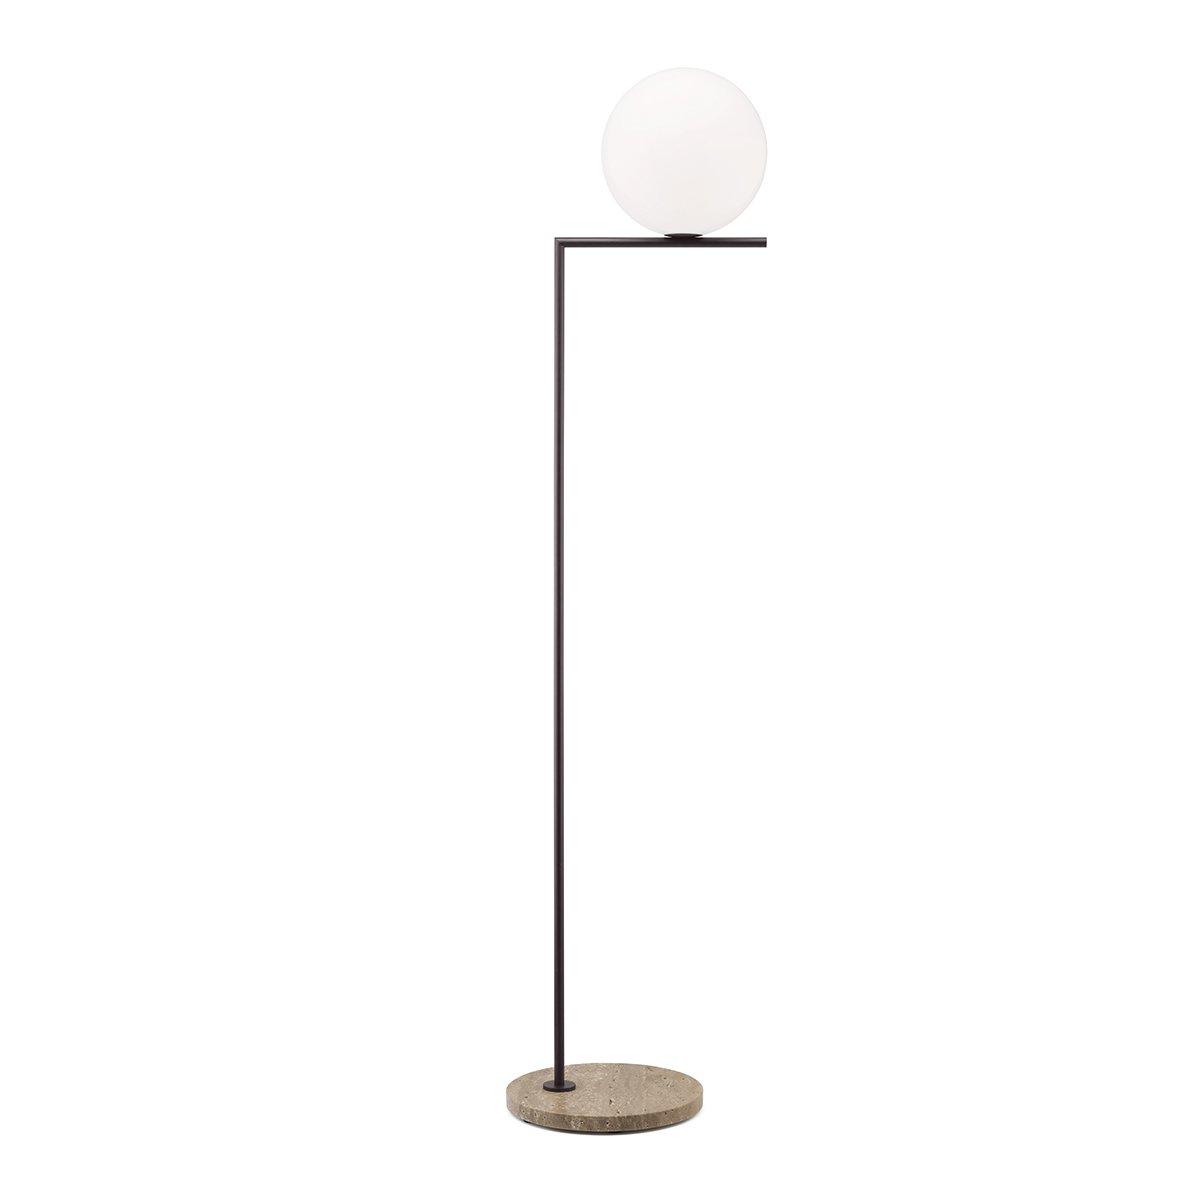 FLOS IC Light Outdoor Vloerlamp F2 - Bruin Aluminium